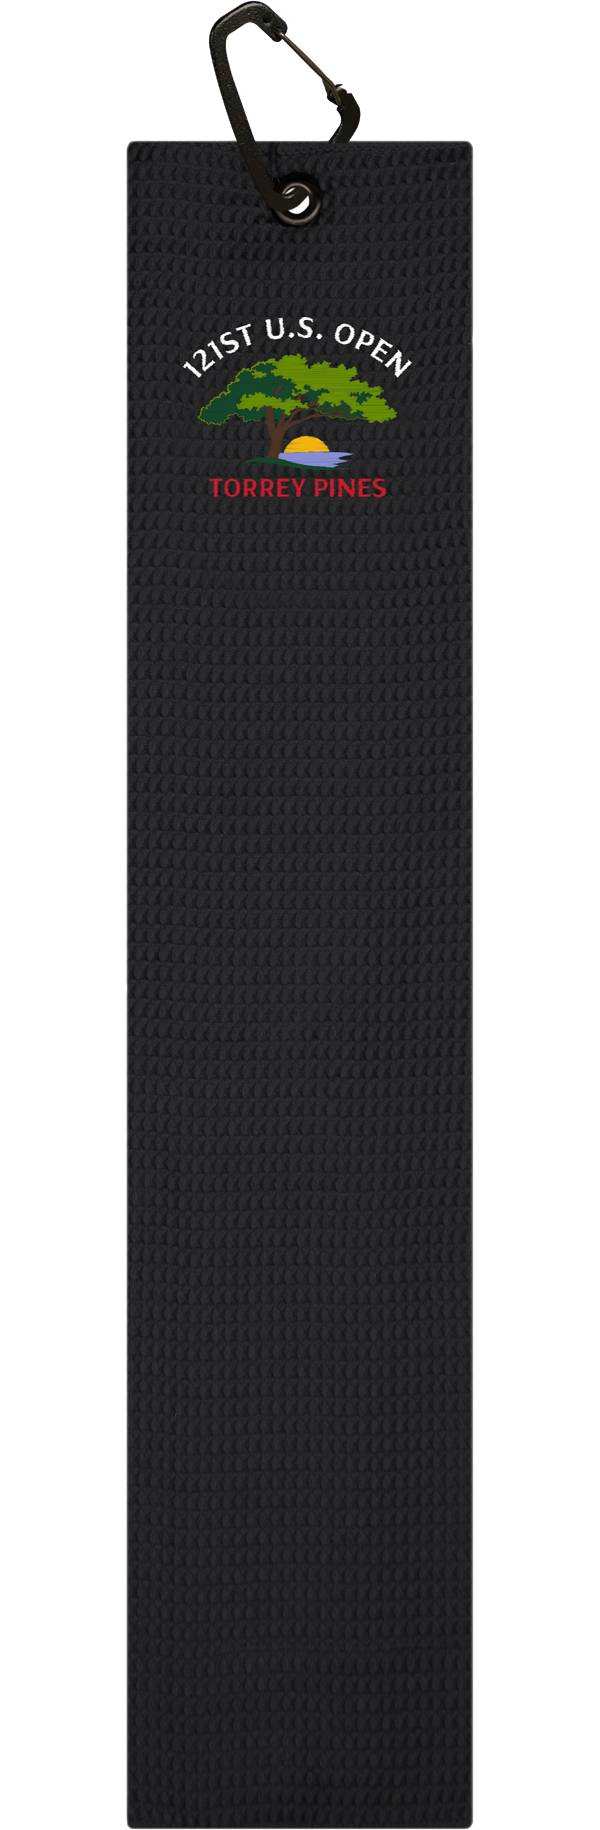 Devant 2021 U.S. Open Tri-fold Microscrubber Towel product image